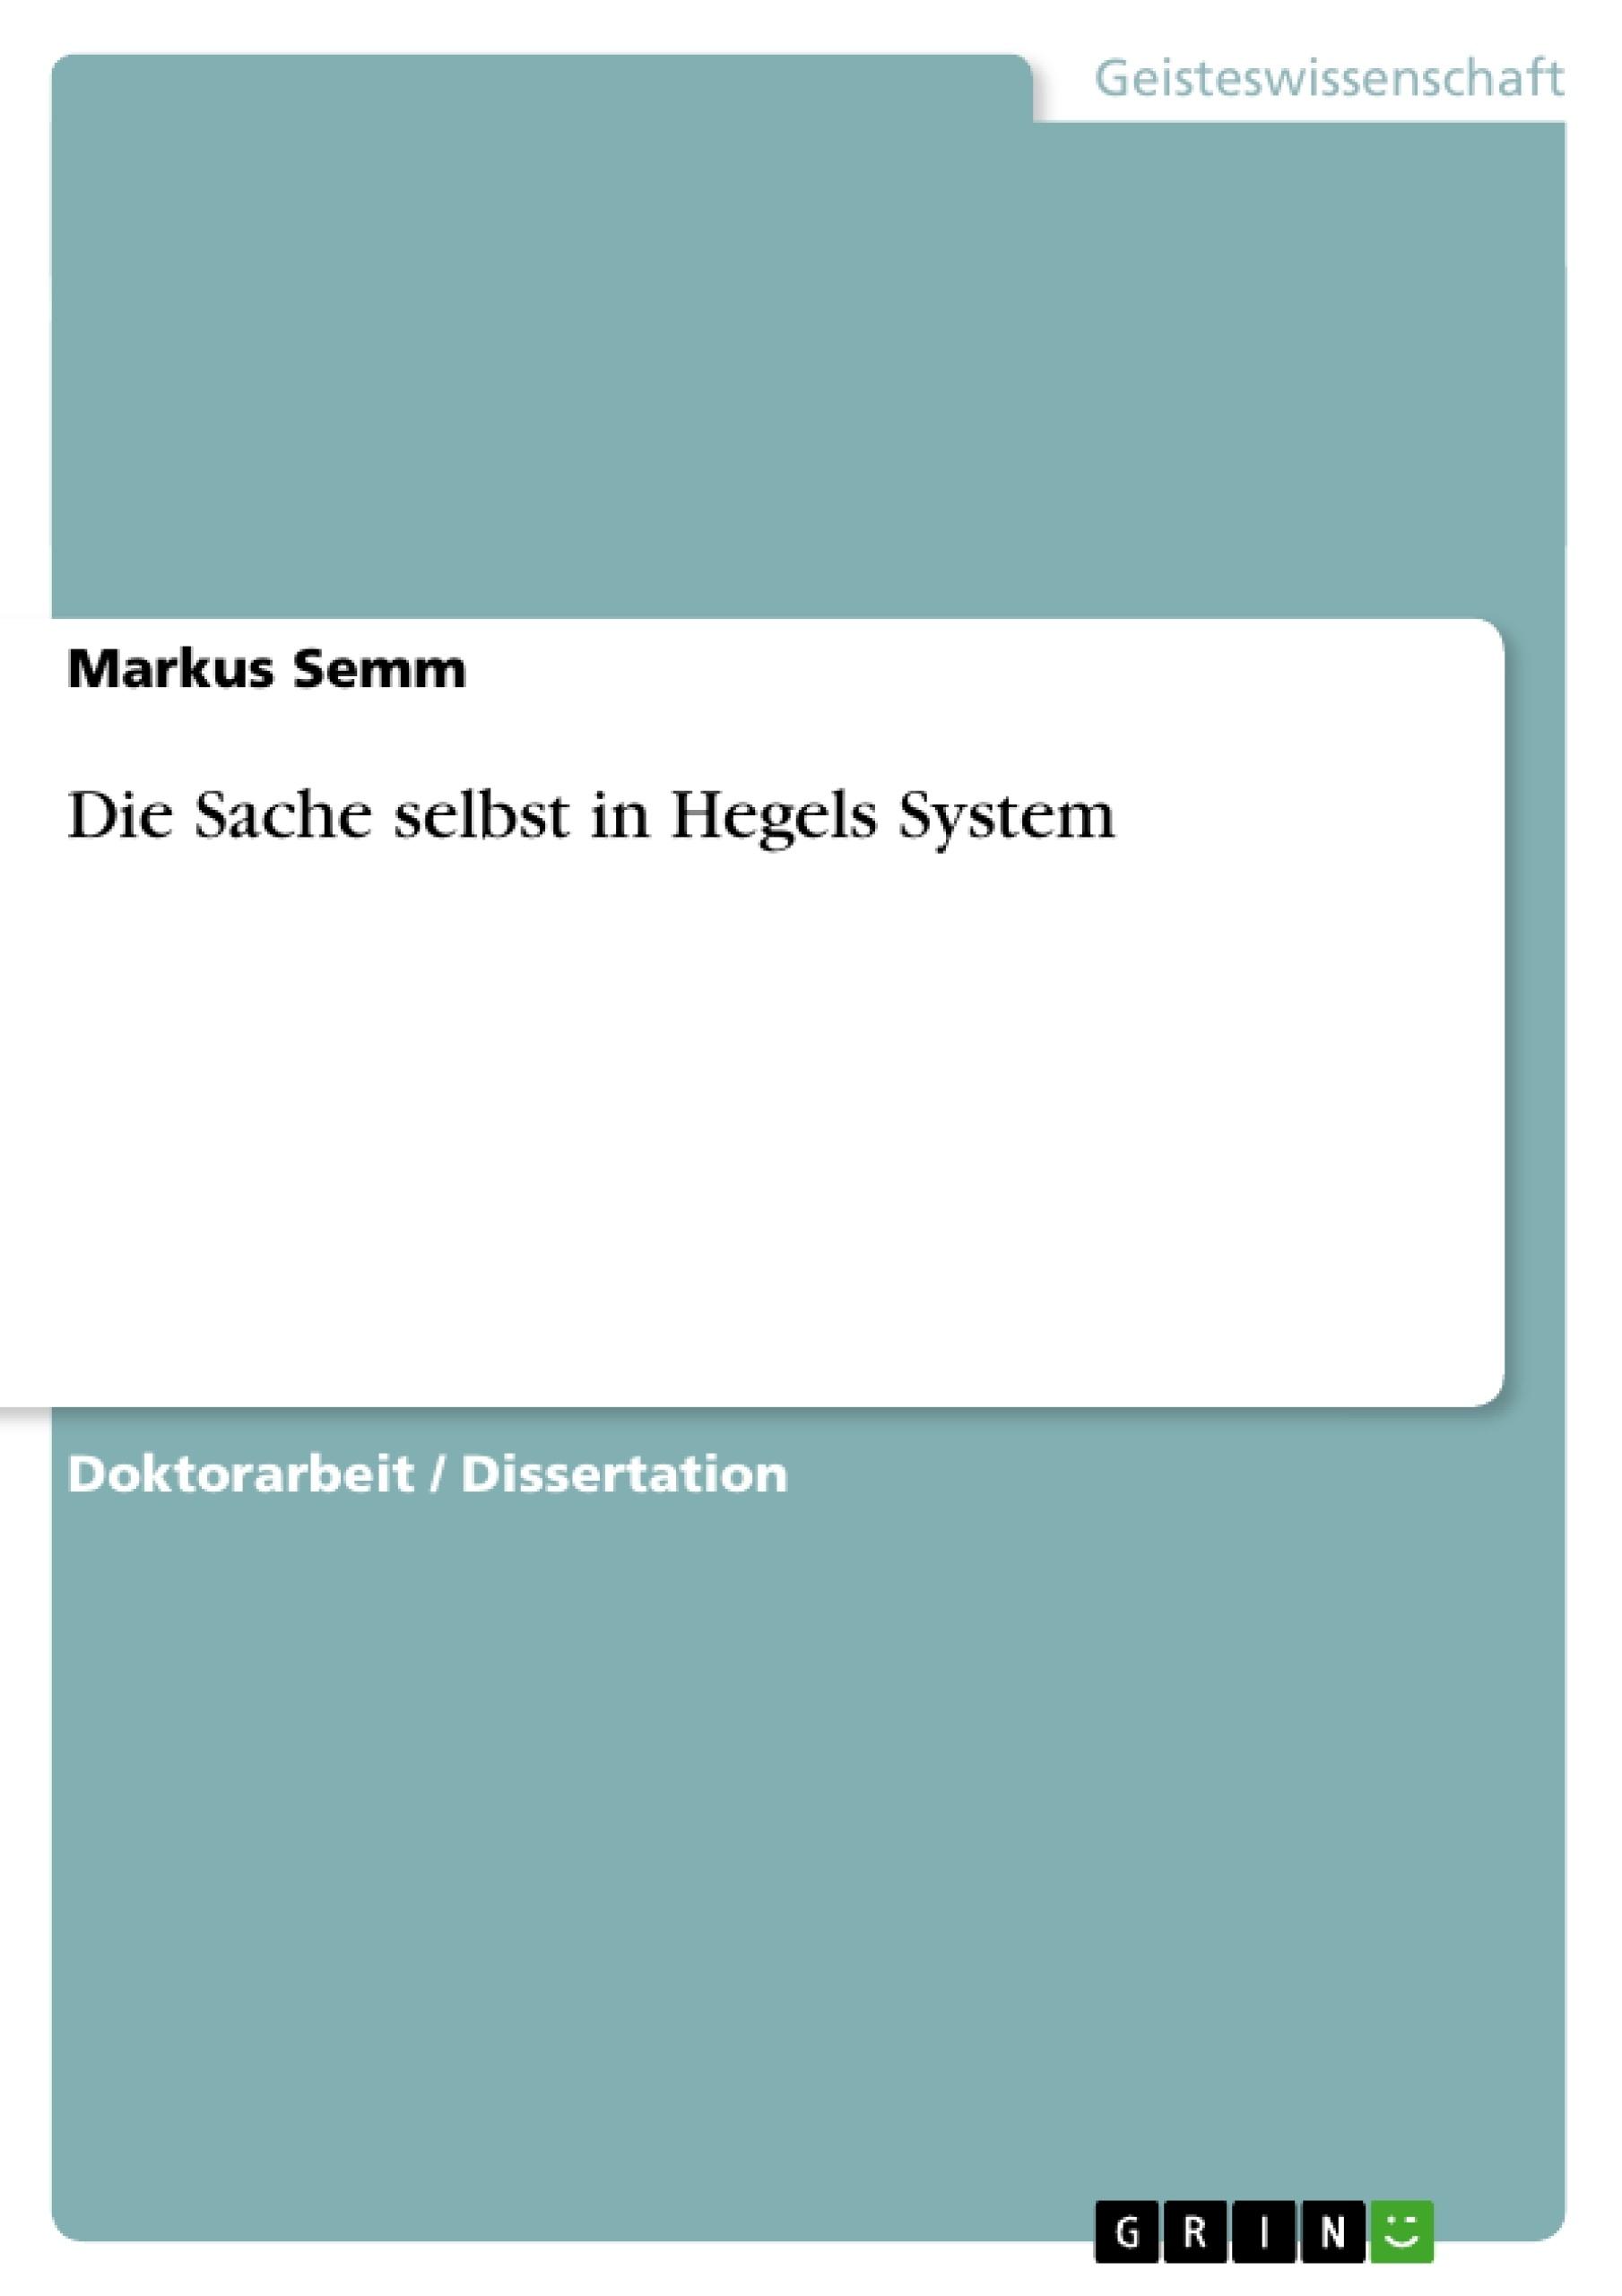 Titel: Die Sache selbst in Hegels System